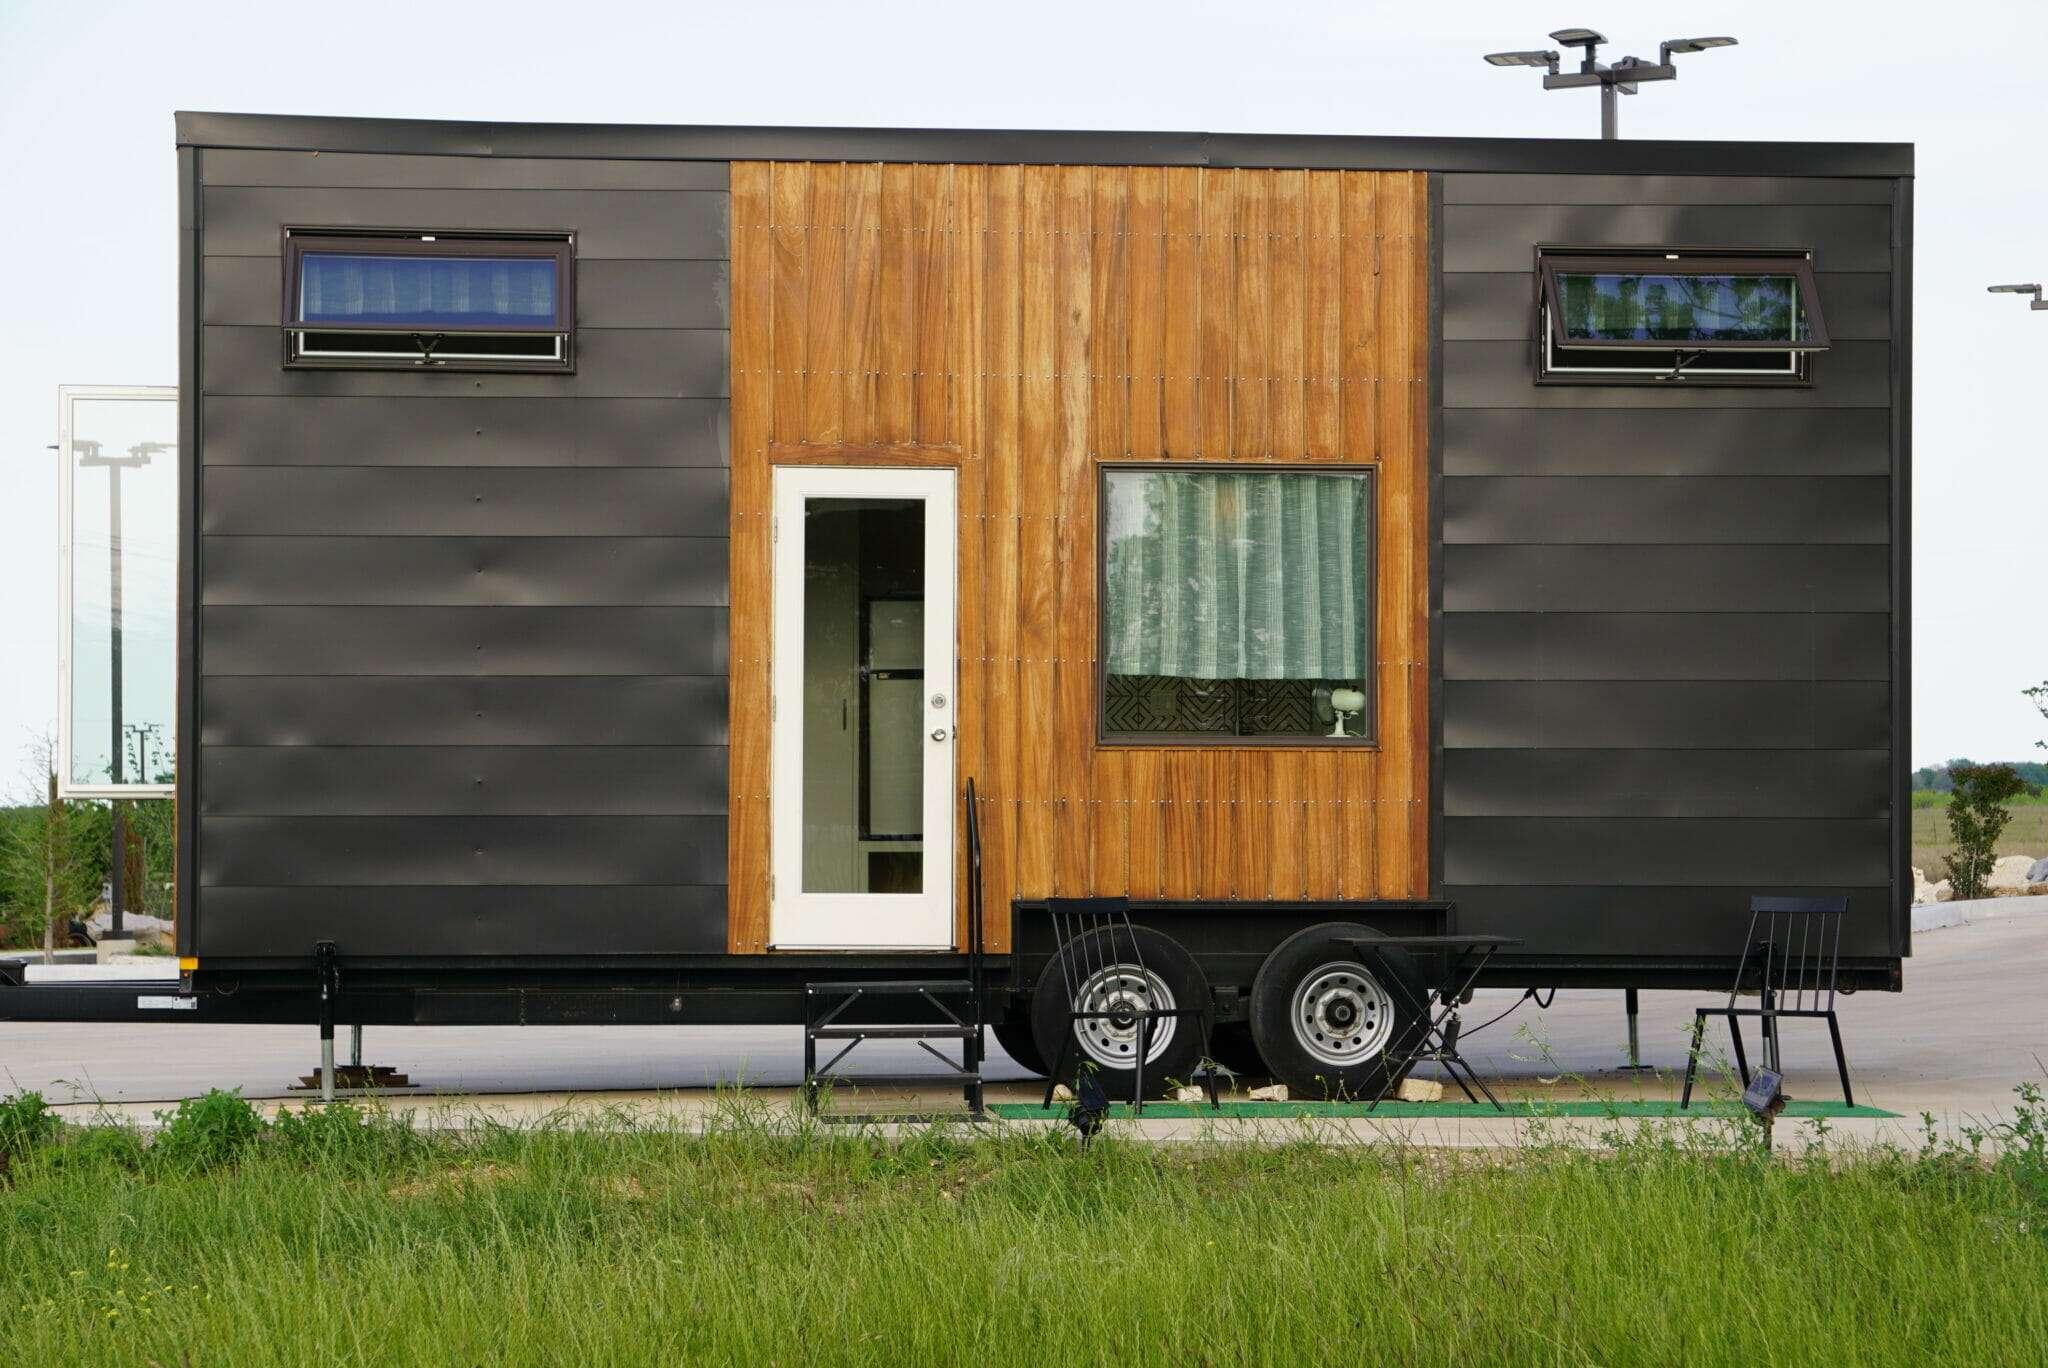 photo of a tiny house on wheels